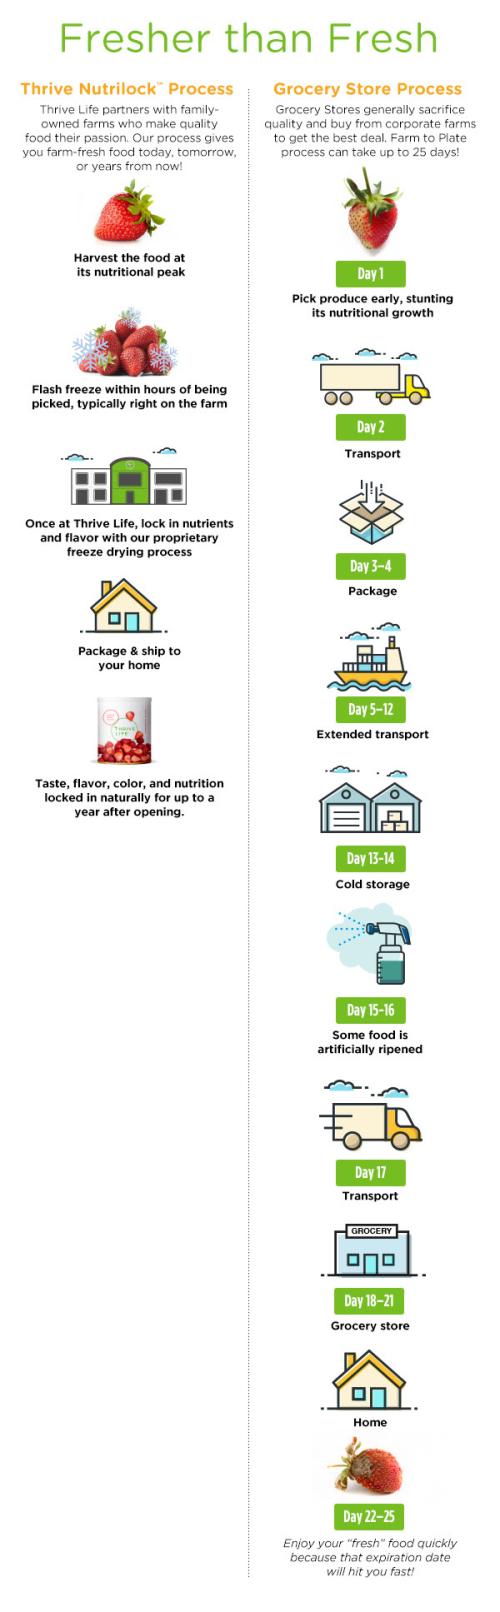 Thrive's Nutrilock Guarantee vs the Grocery Store www.HealthyEasyFood.com